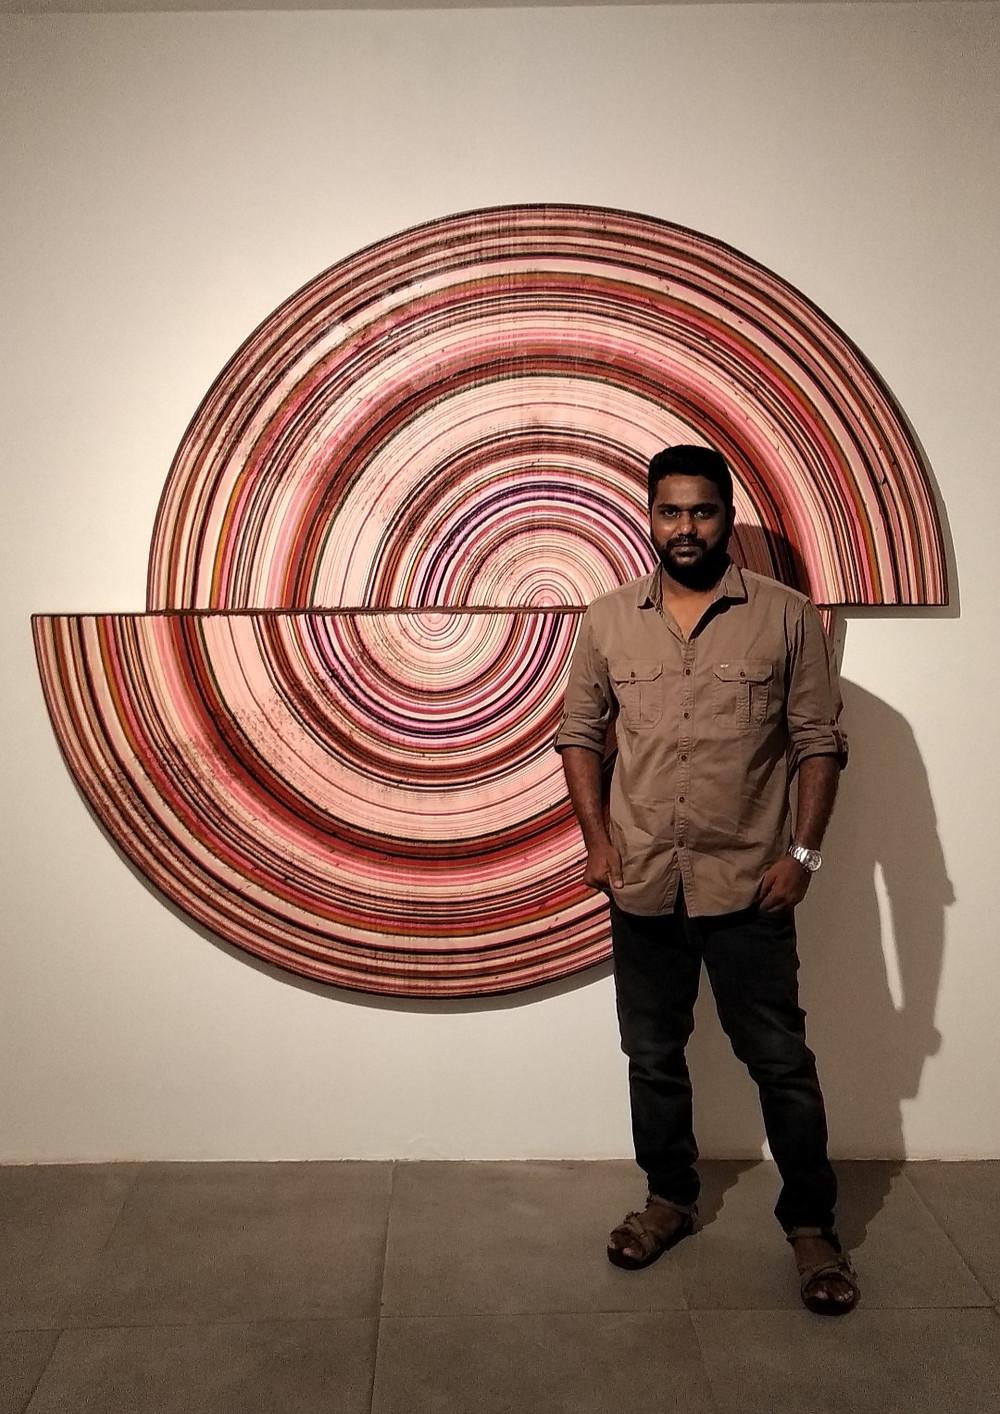 Kumaresan Selvaraj at the exhibition 'Lines of Sight' at Exhibit 320